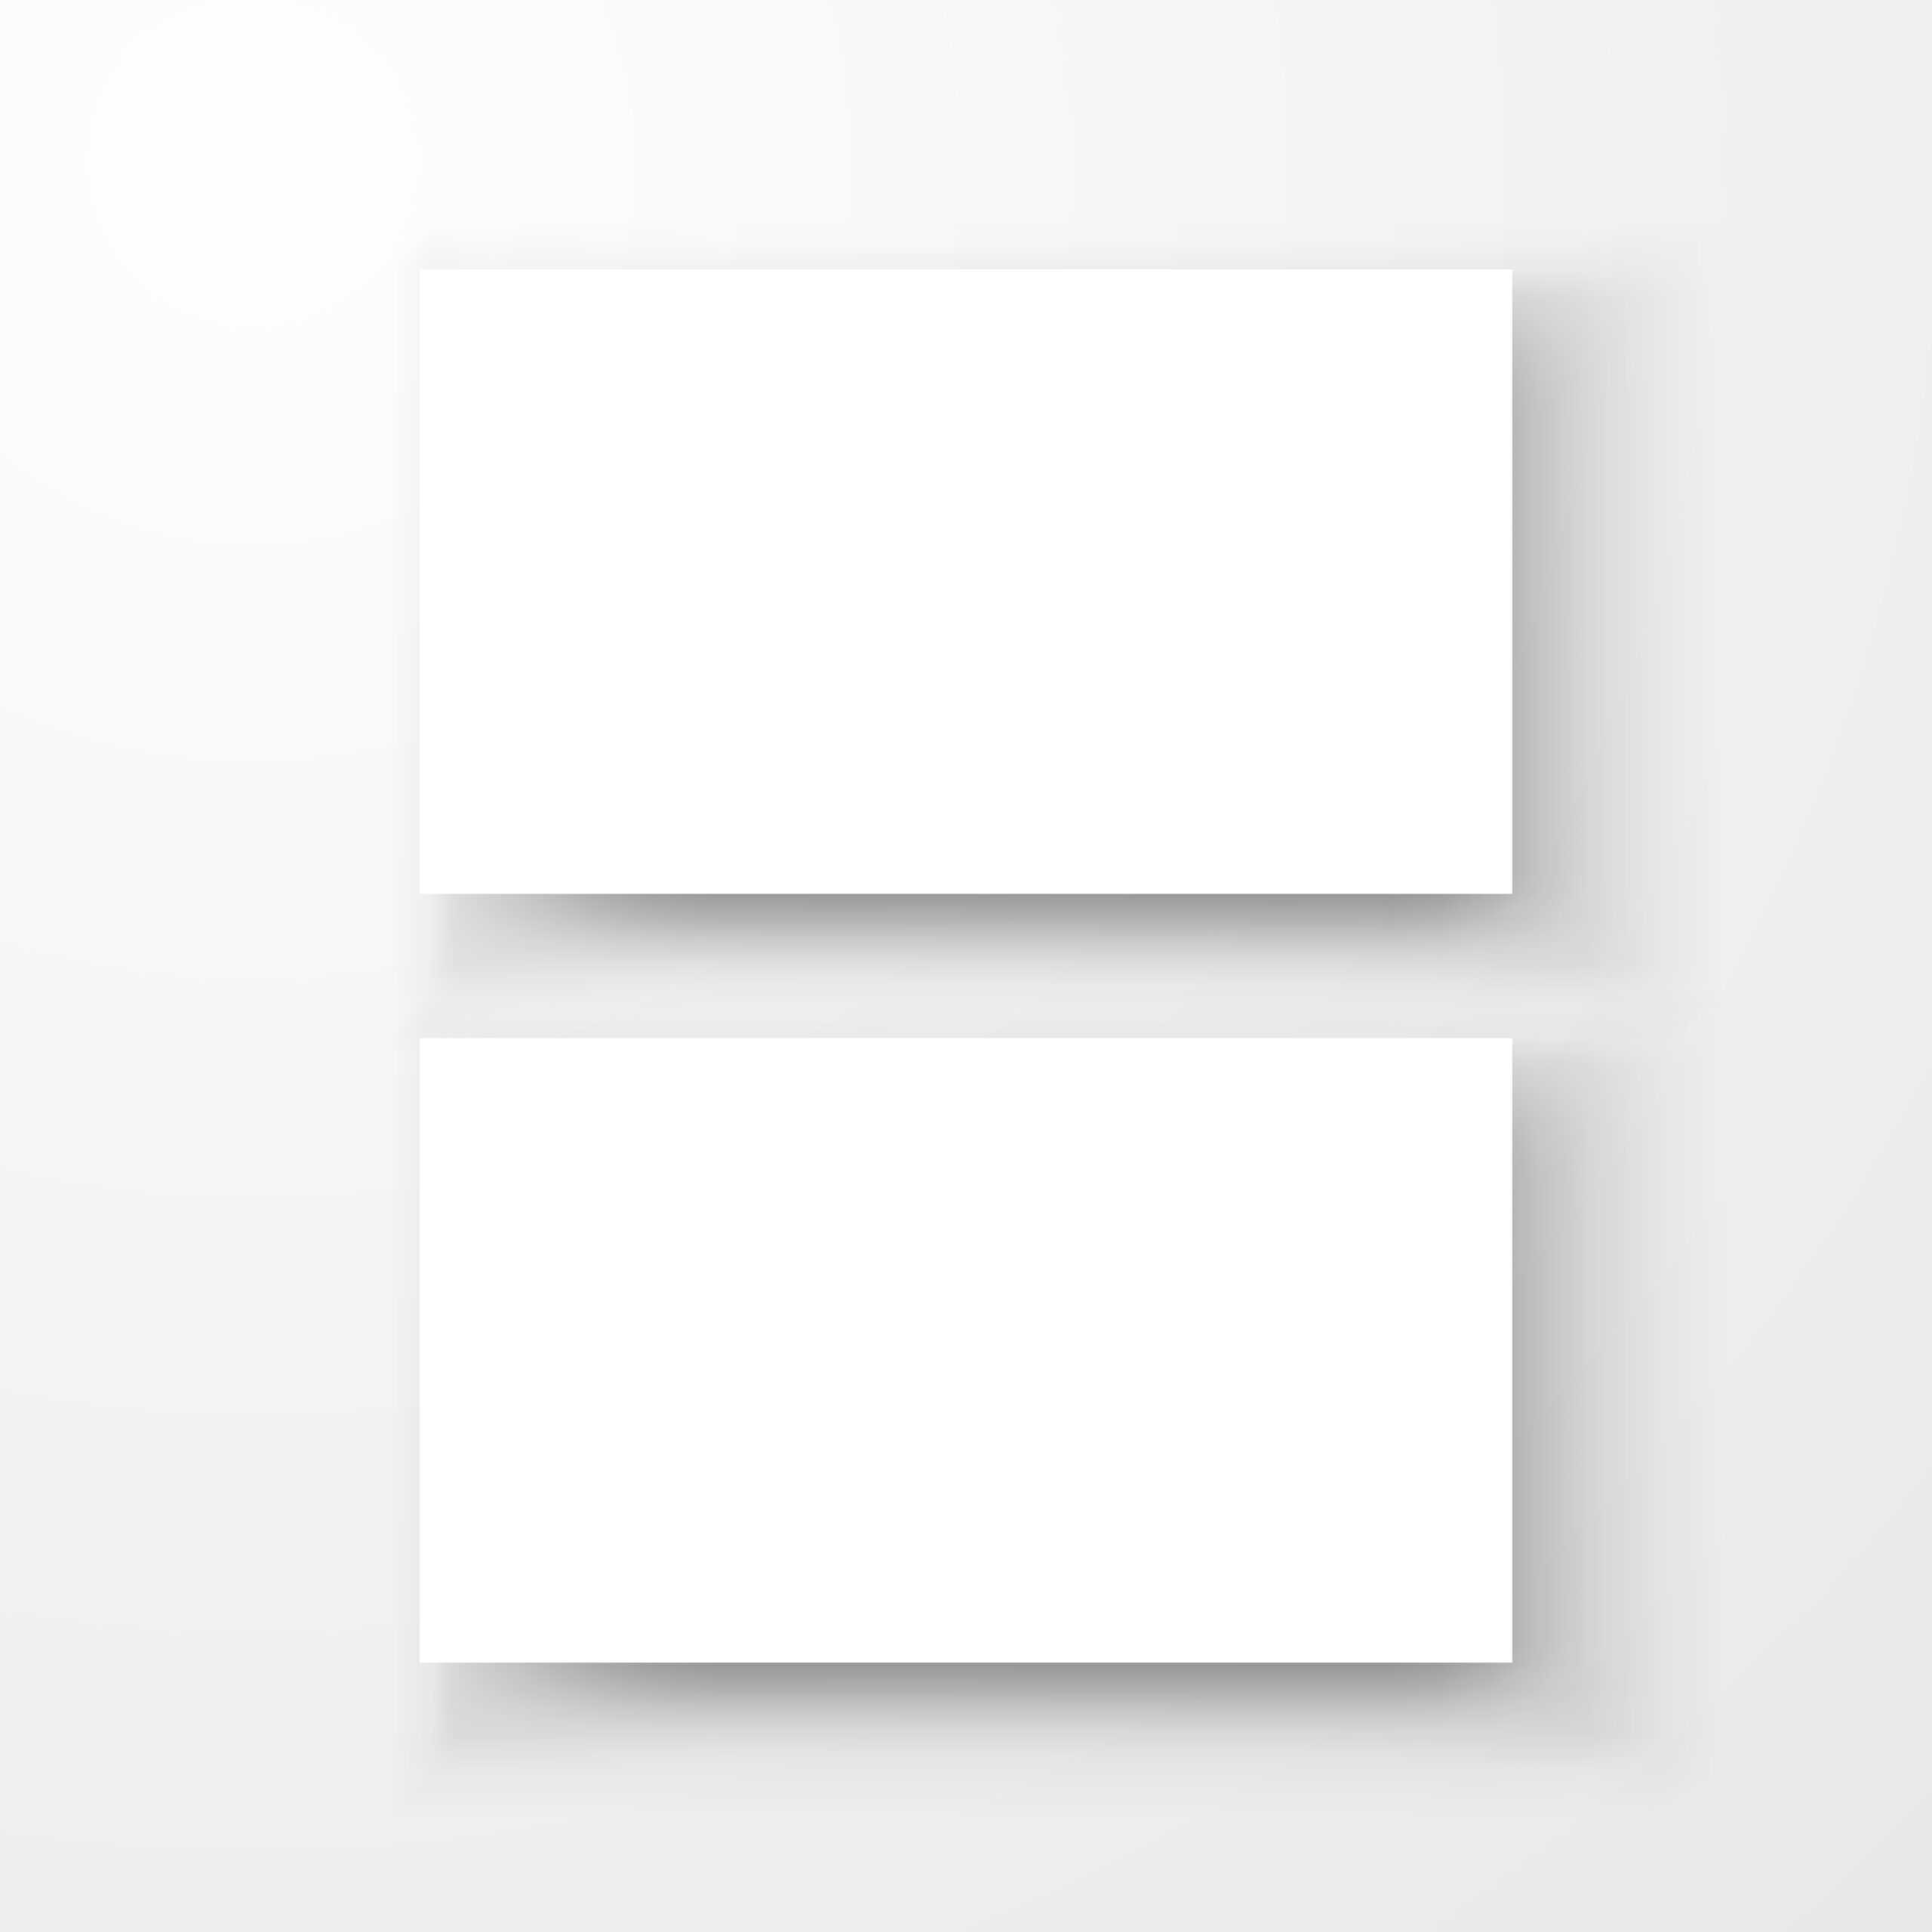 Blank Business Card Mockup Template Createdvector Within Blank Business Card Template Download